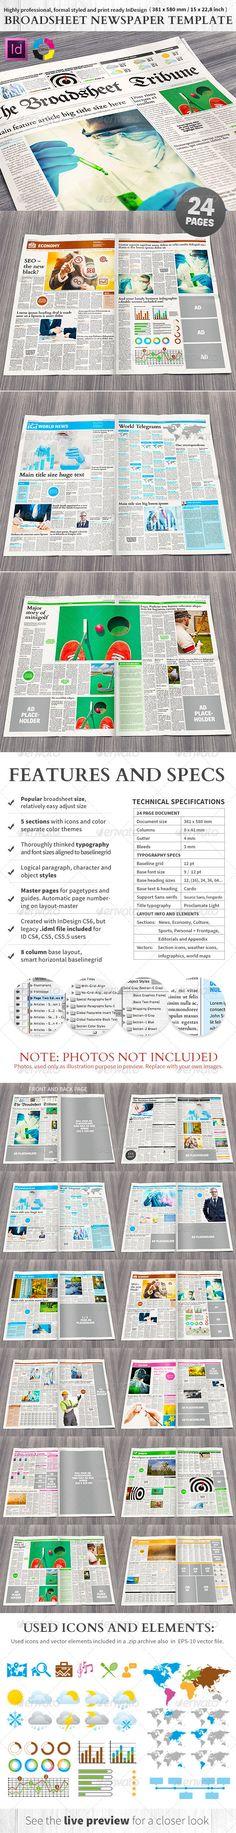 Indesign Modern Newspaper Magazine Template A3 Newspaper - sample forbearance agreement